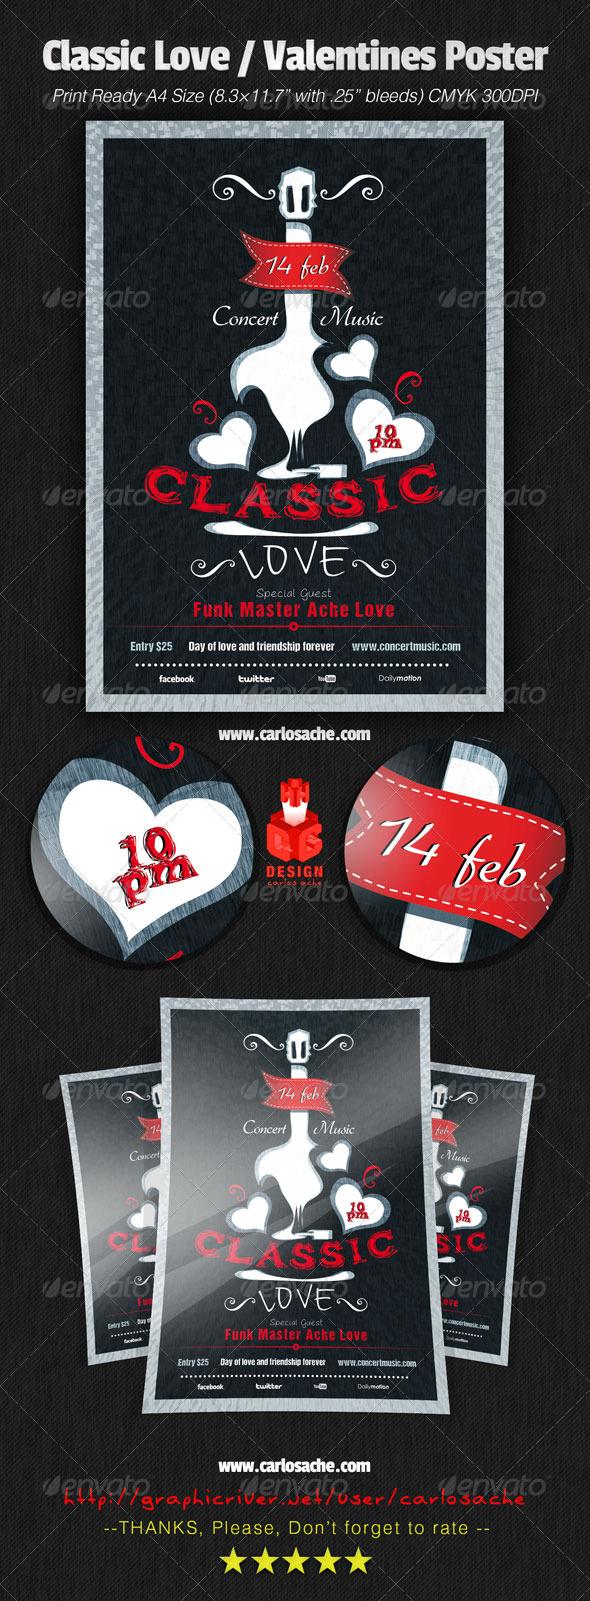 GraphicRiver Classic Love Valentines Poster 6588898